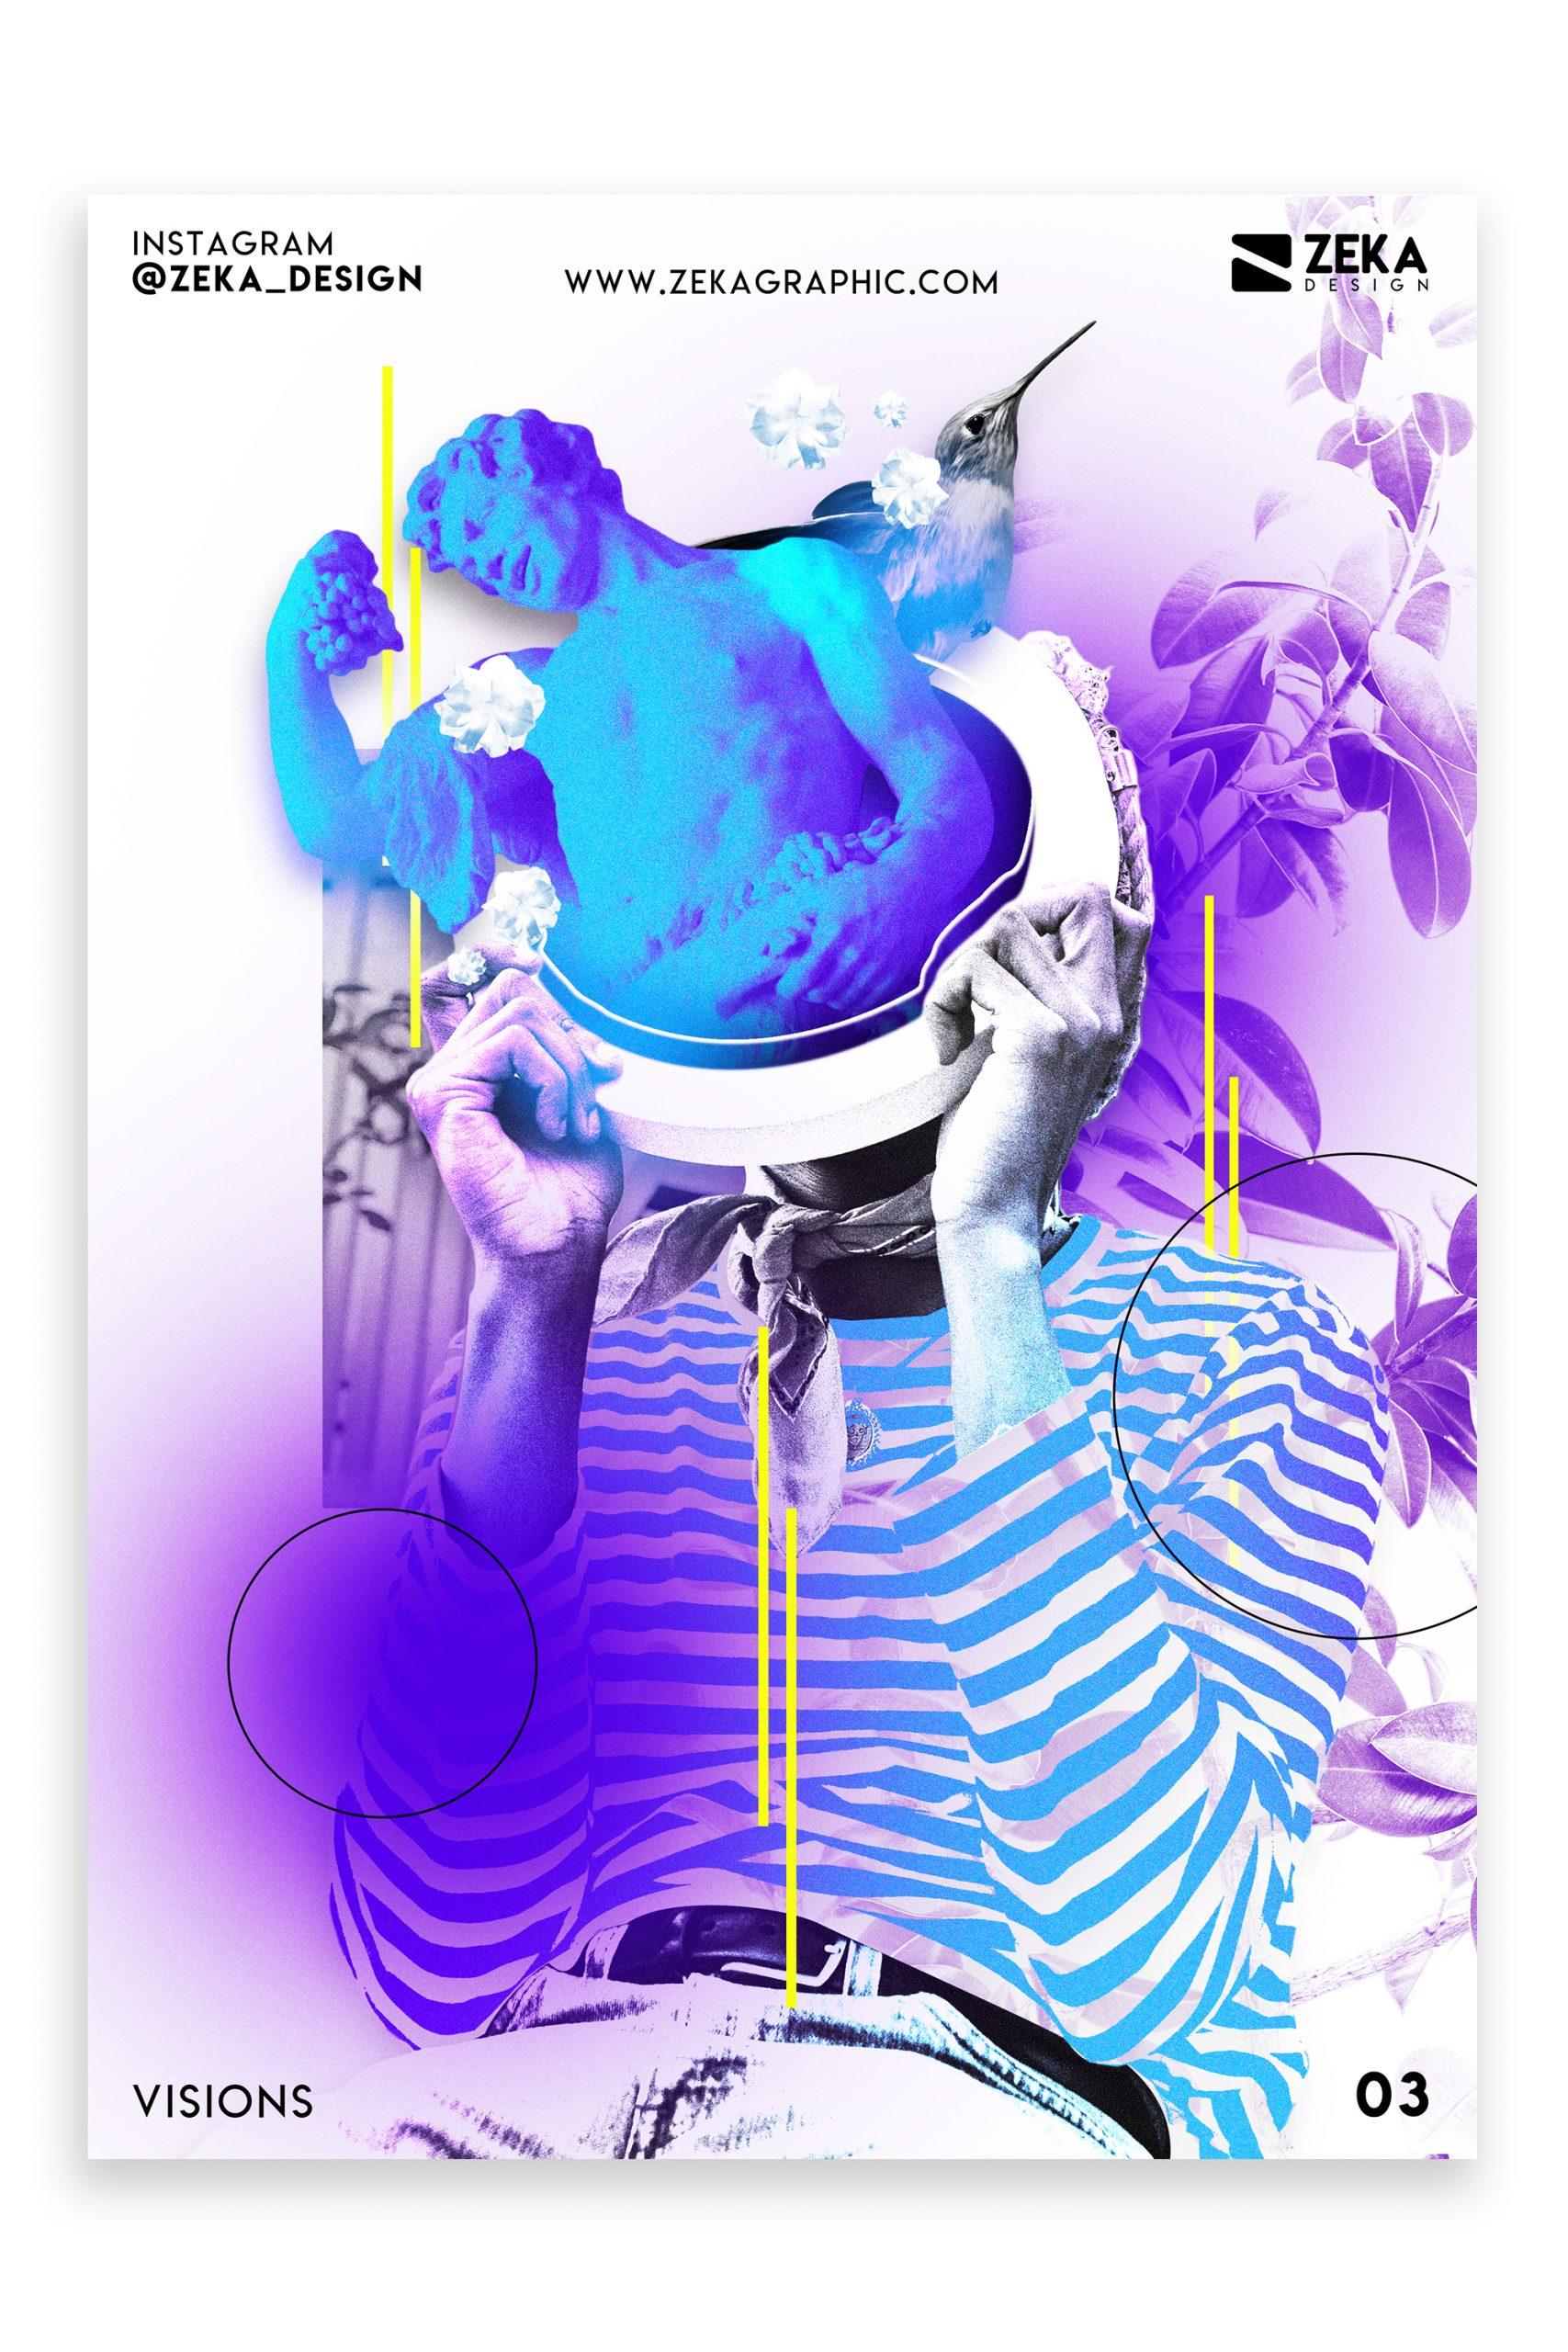 Visions Poster Design Inspiration Zeka Design Graphic Design Portfolio 3